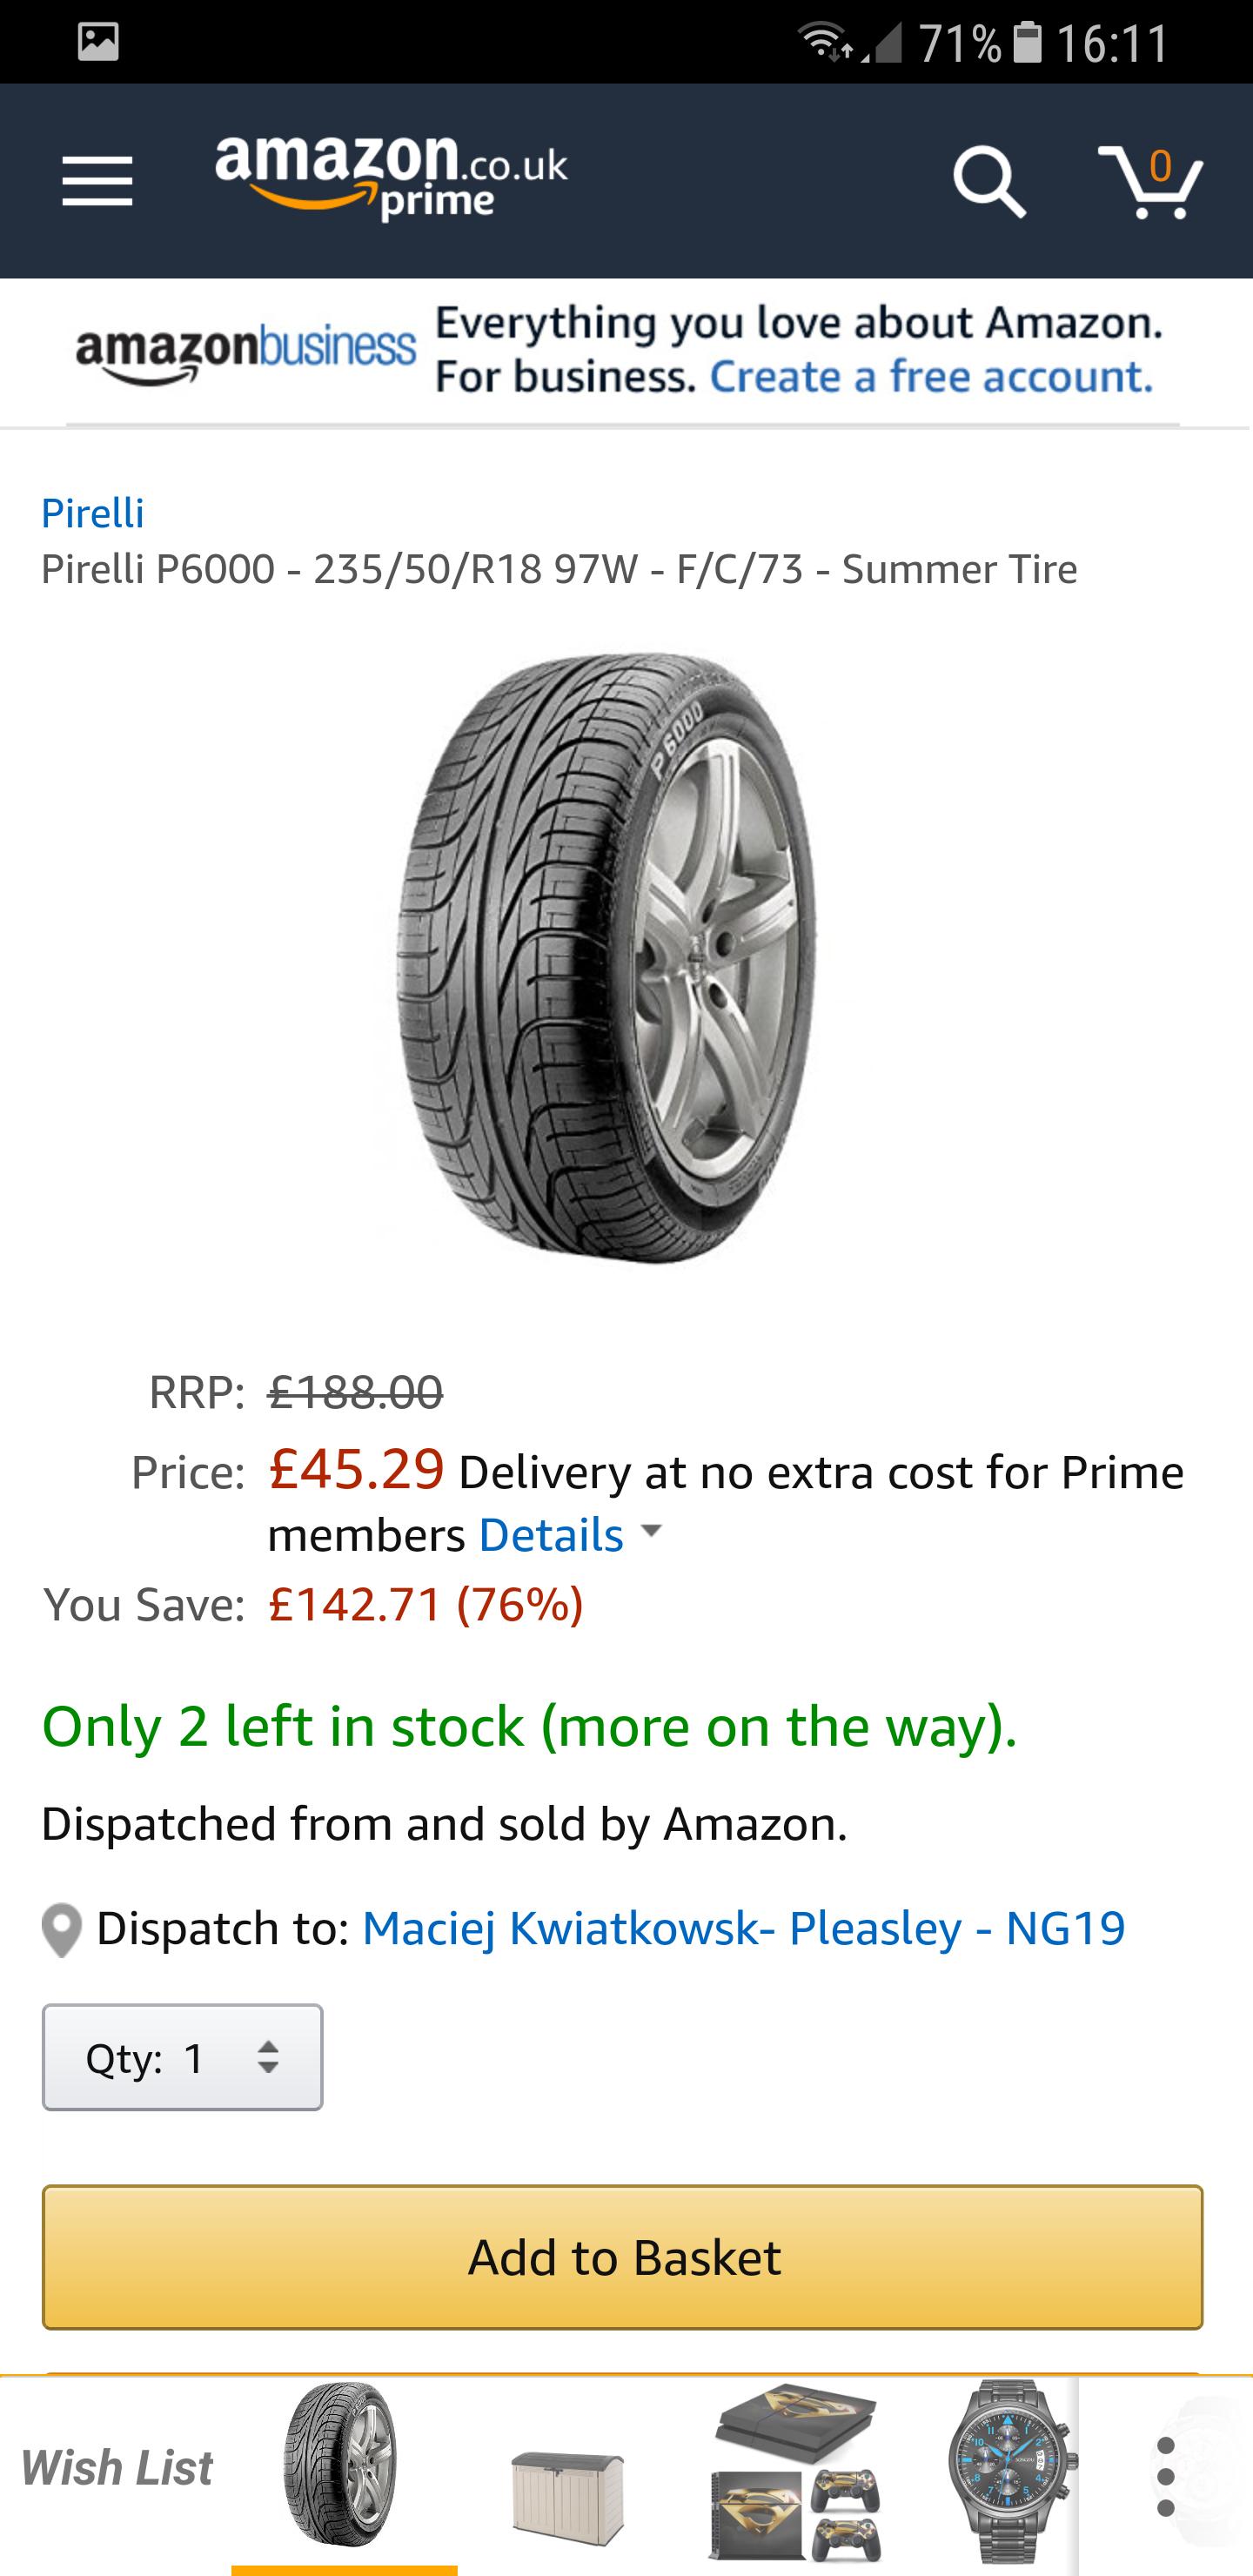 Pirelli P600 235/50/18 F/C/73 at Amazon for £45